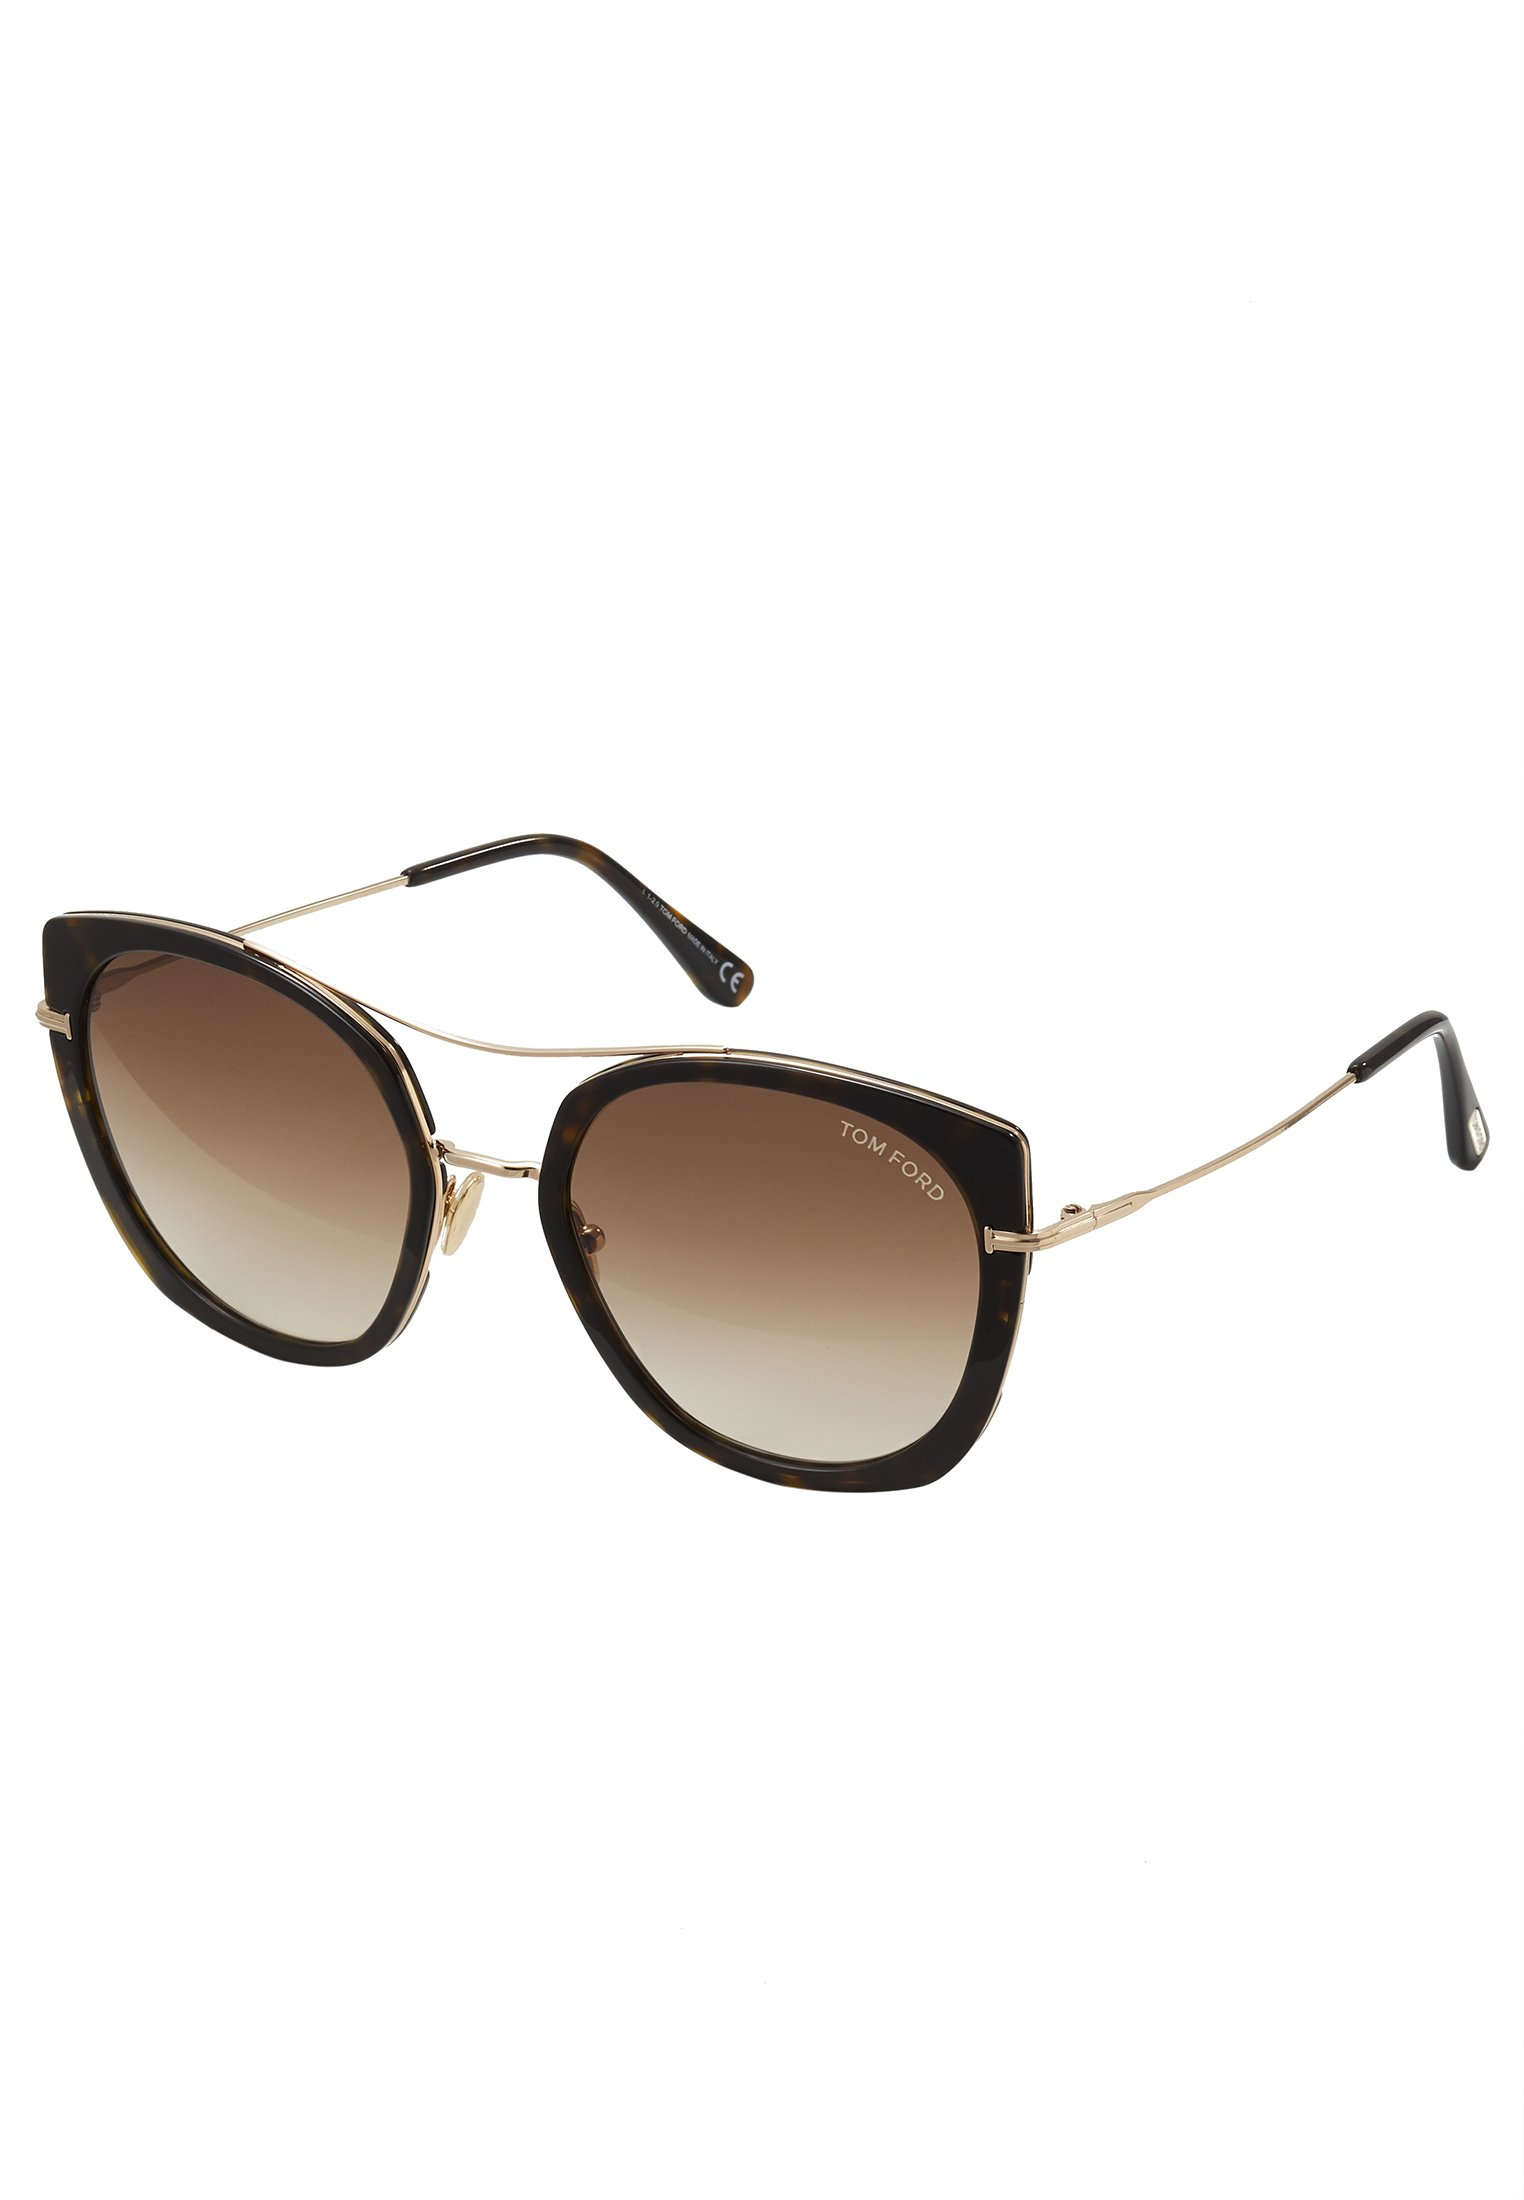 Tom Ford Solbriller brown Zalando.no